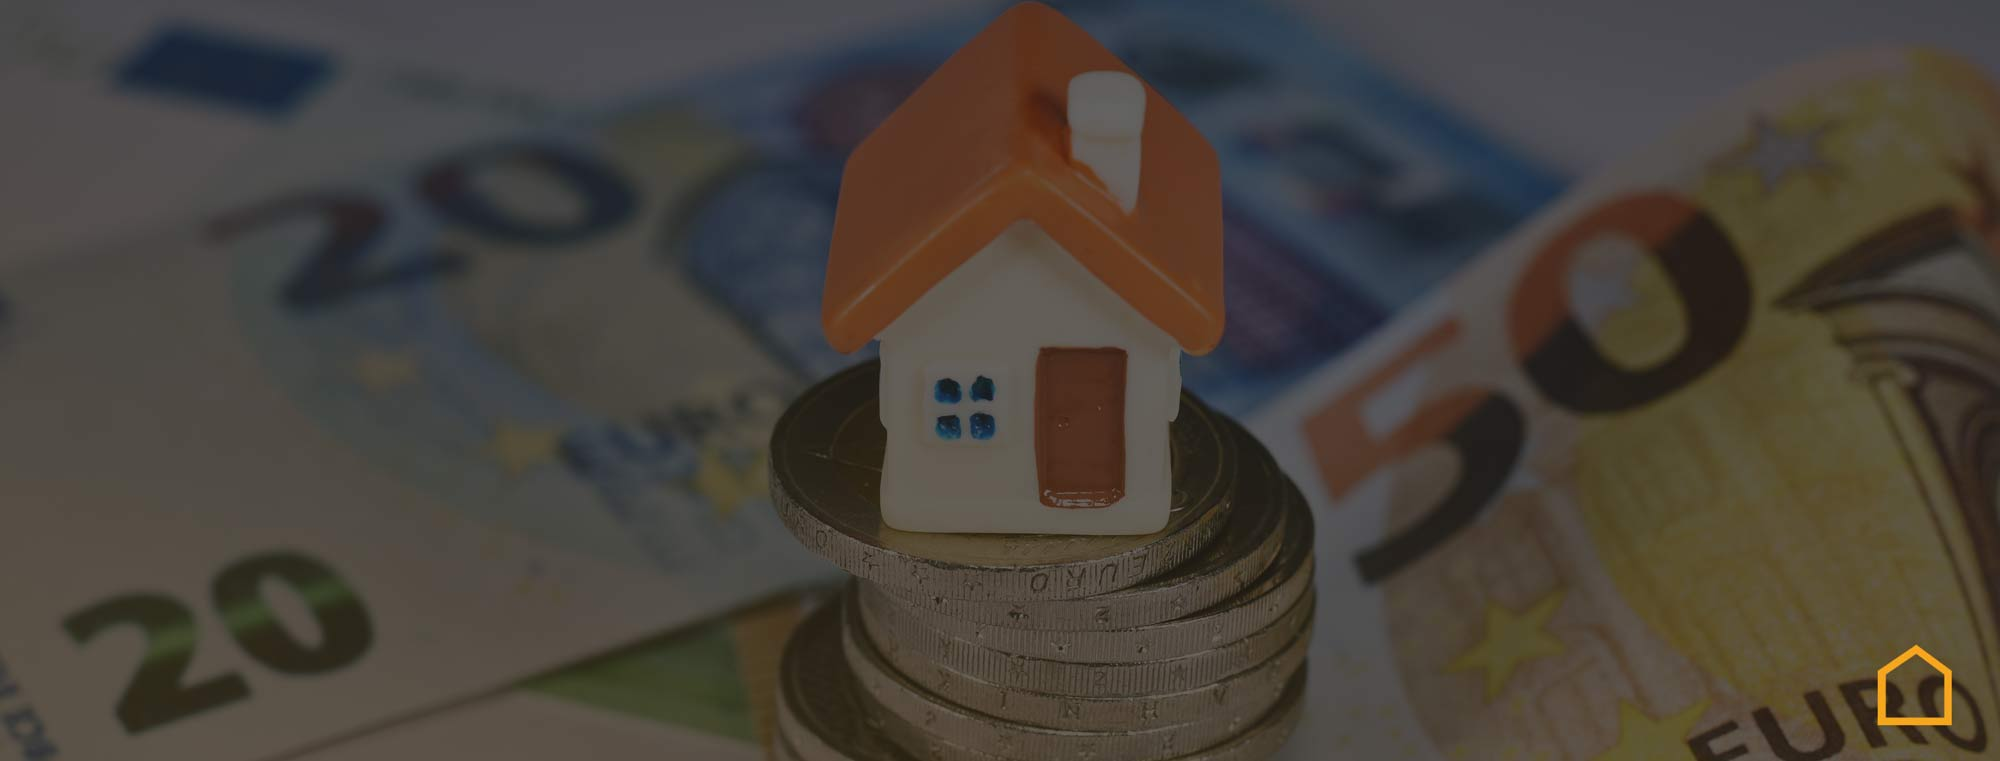 city immobilienmakler lexikon finanzen